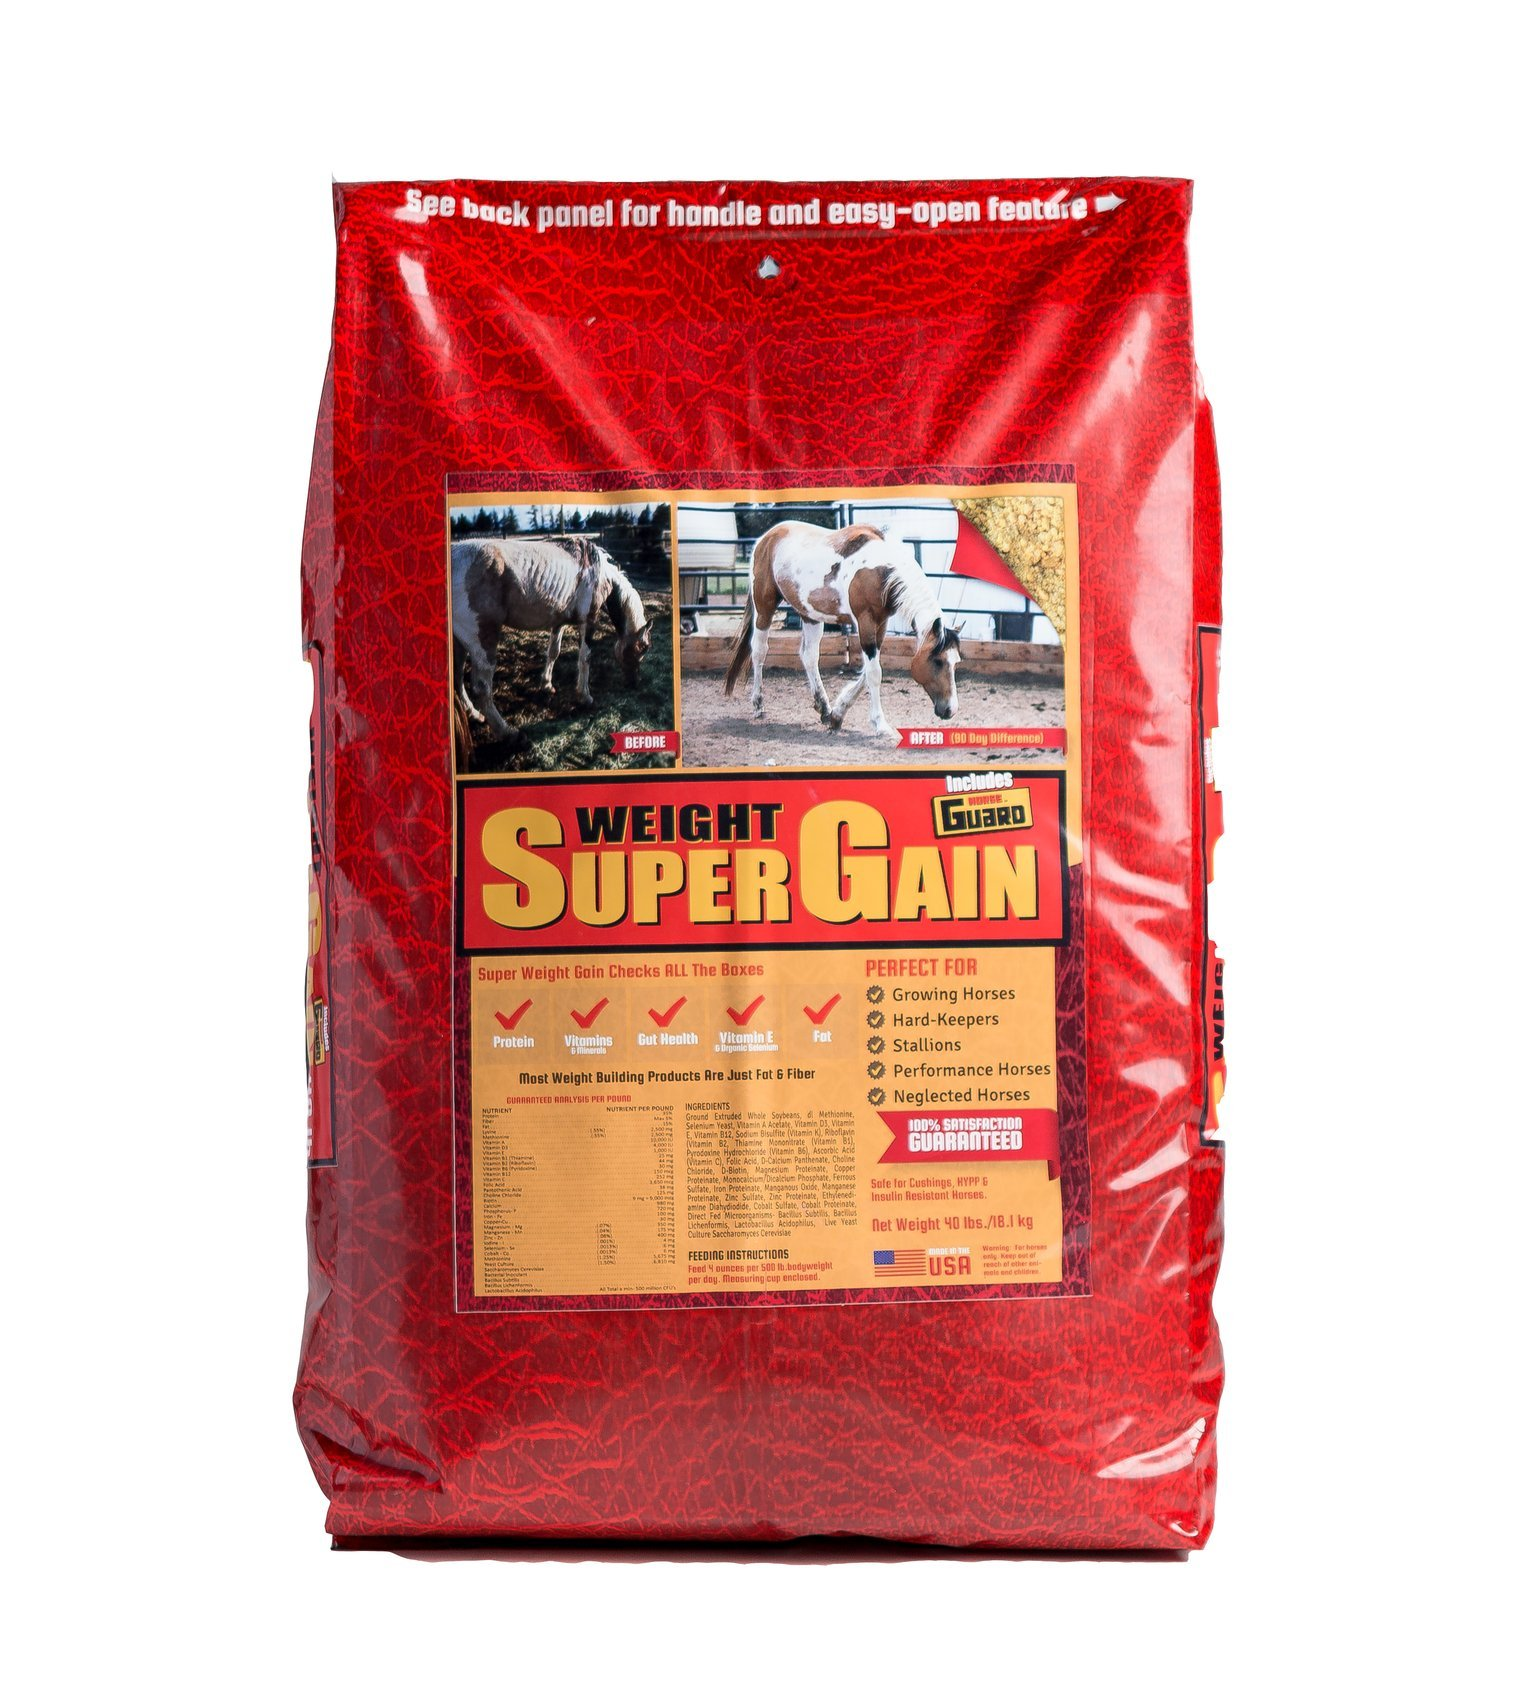 Horse Guard Super Weight Gain Equine Vitamin Mineral, Probiotic & Weight Gain Supplement, 40 lb